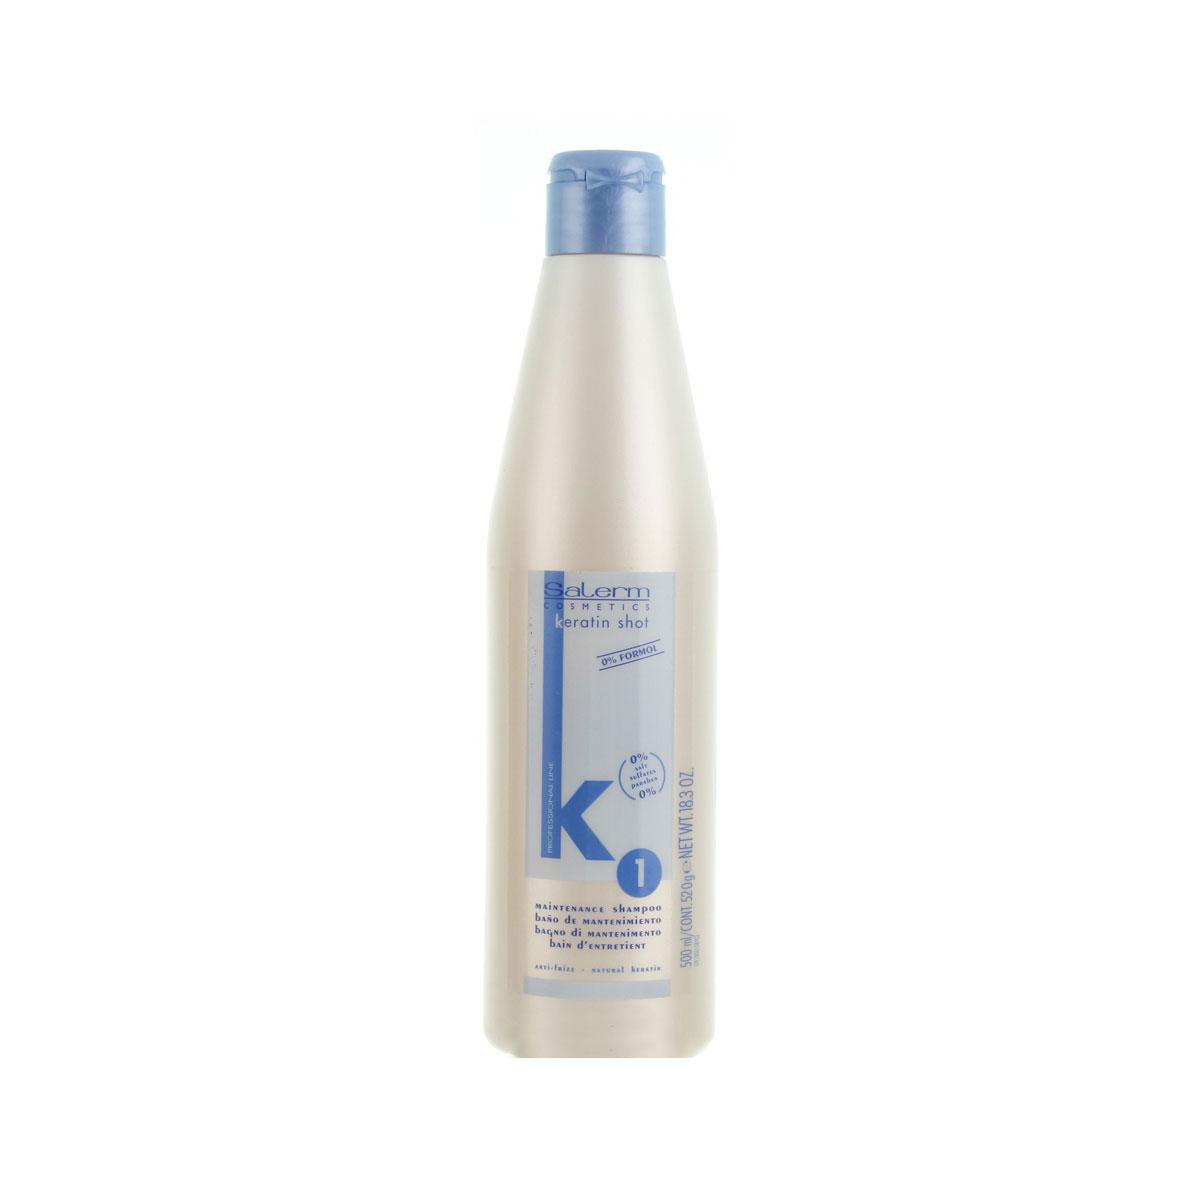 Keratin shot ba o de mantenimiento shampoo salerm - Bano de keratina ...